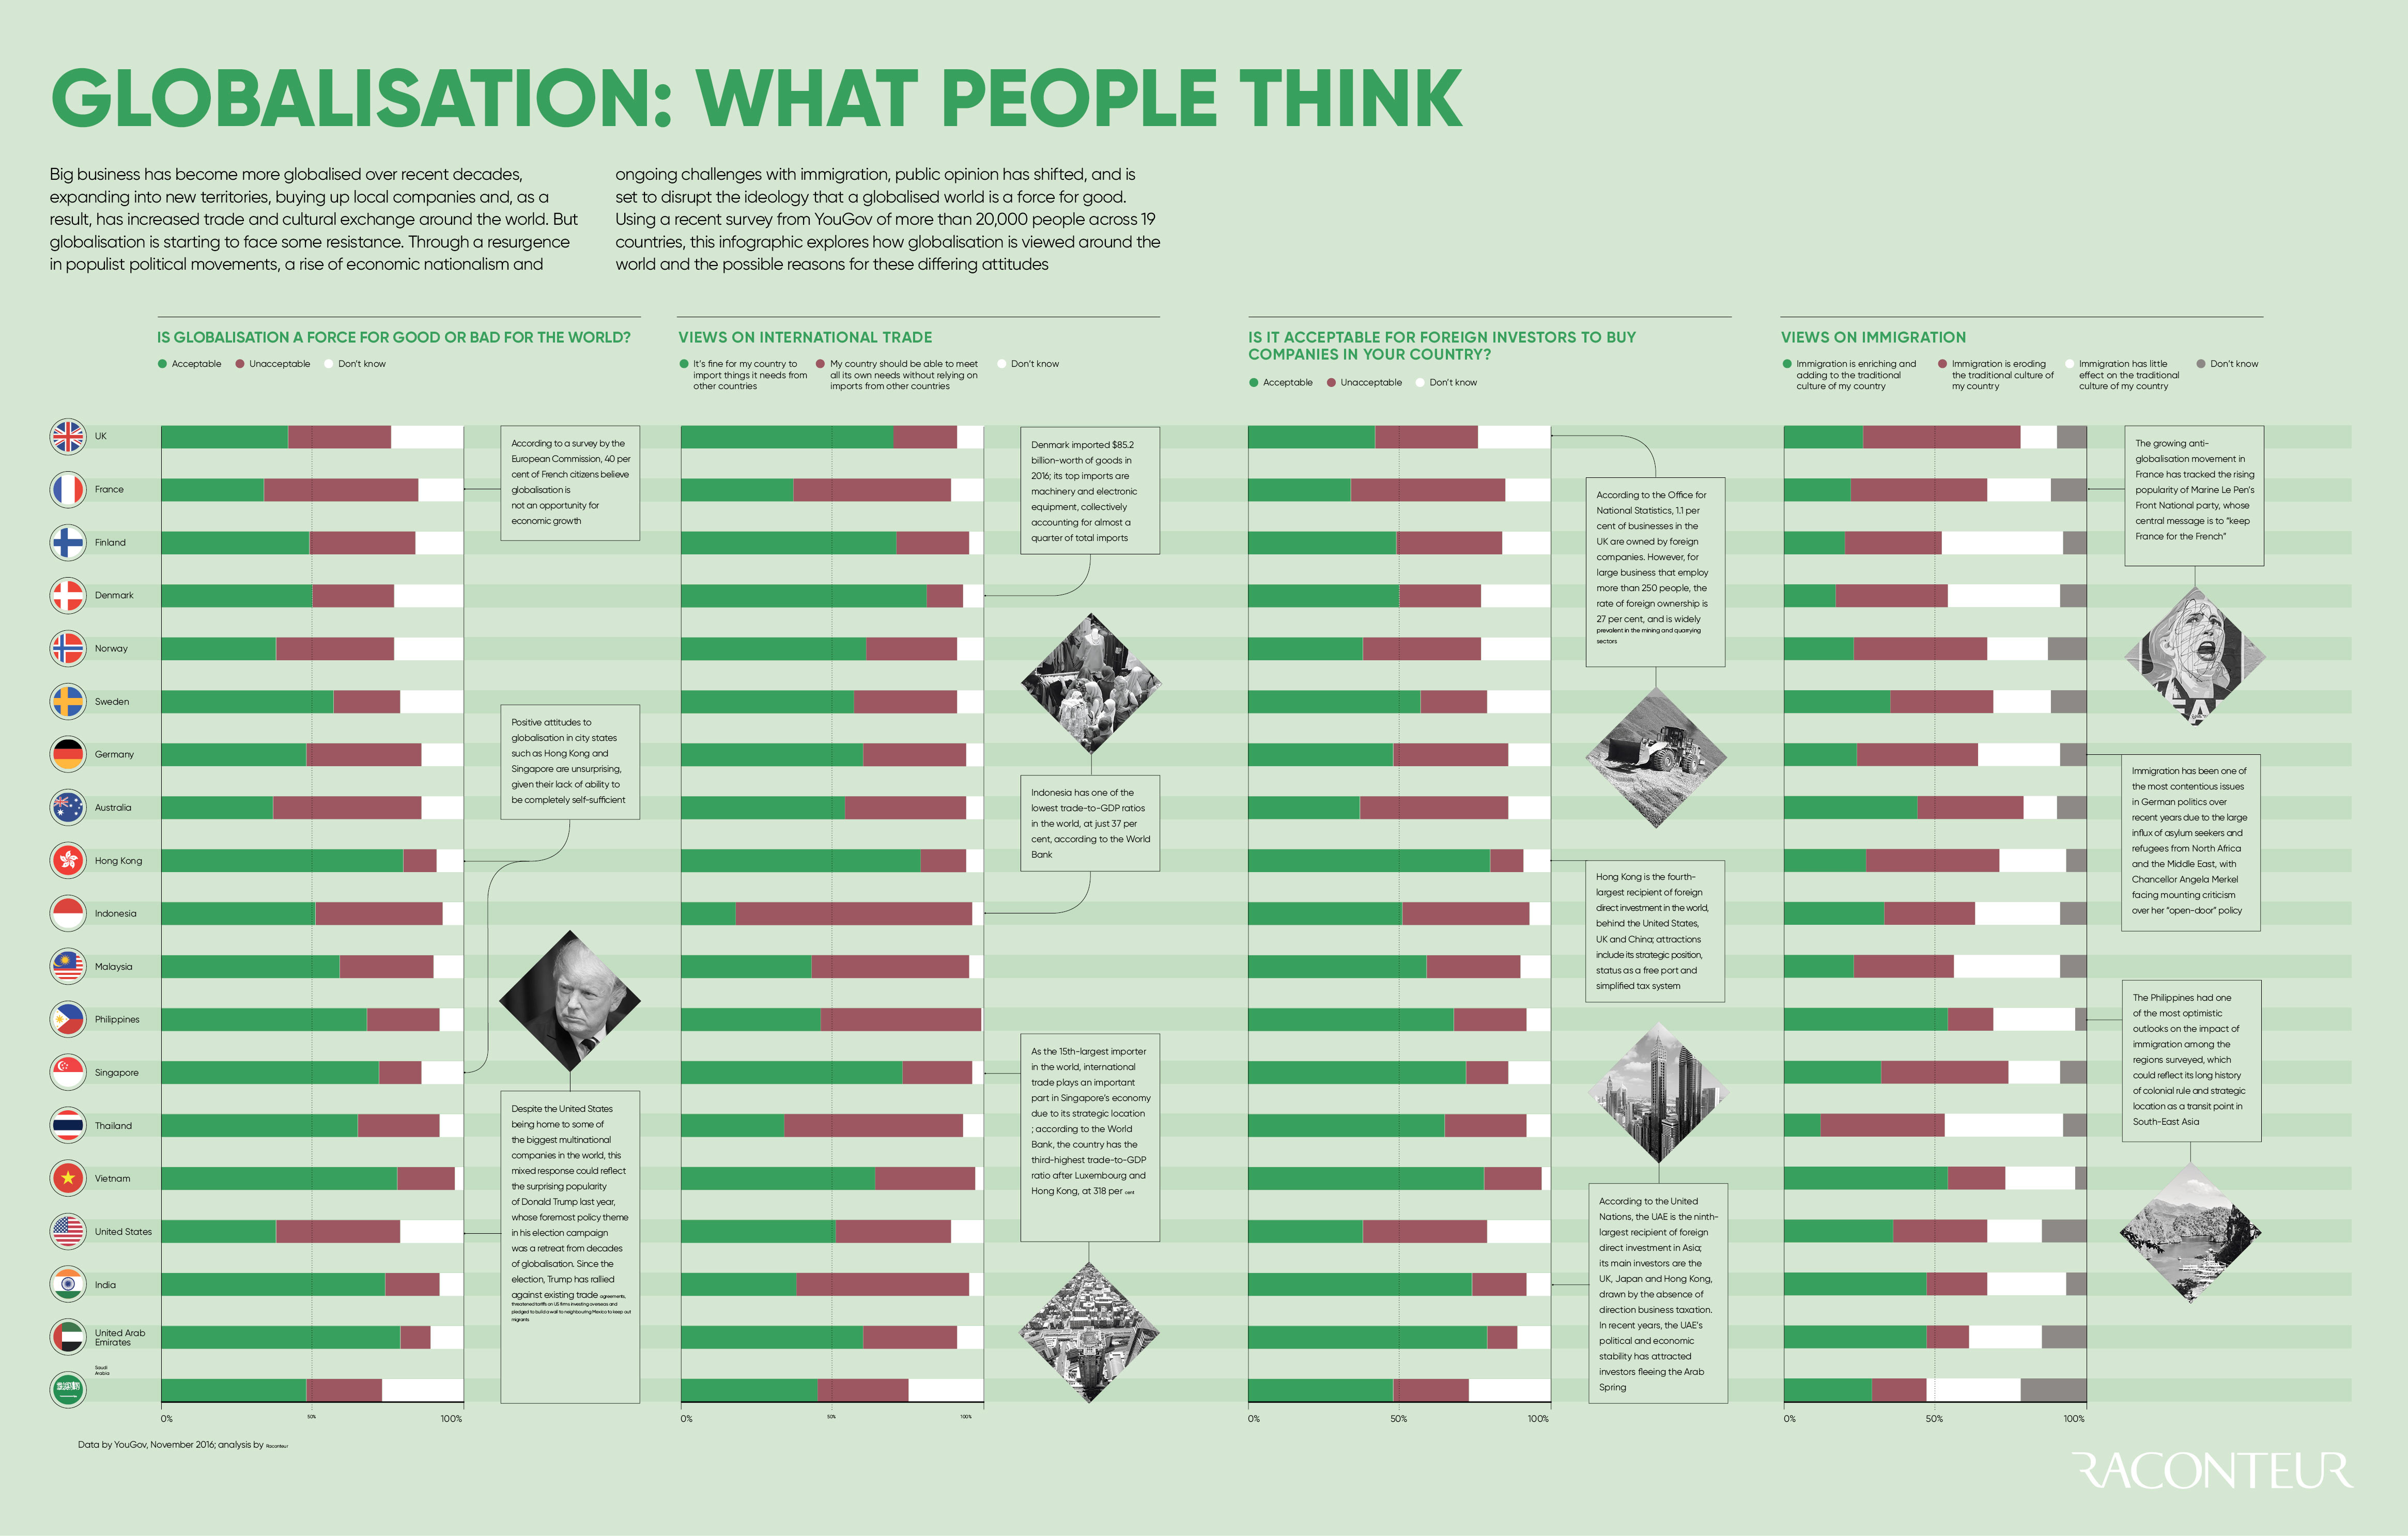 Globalisation Infographic